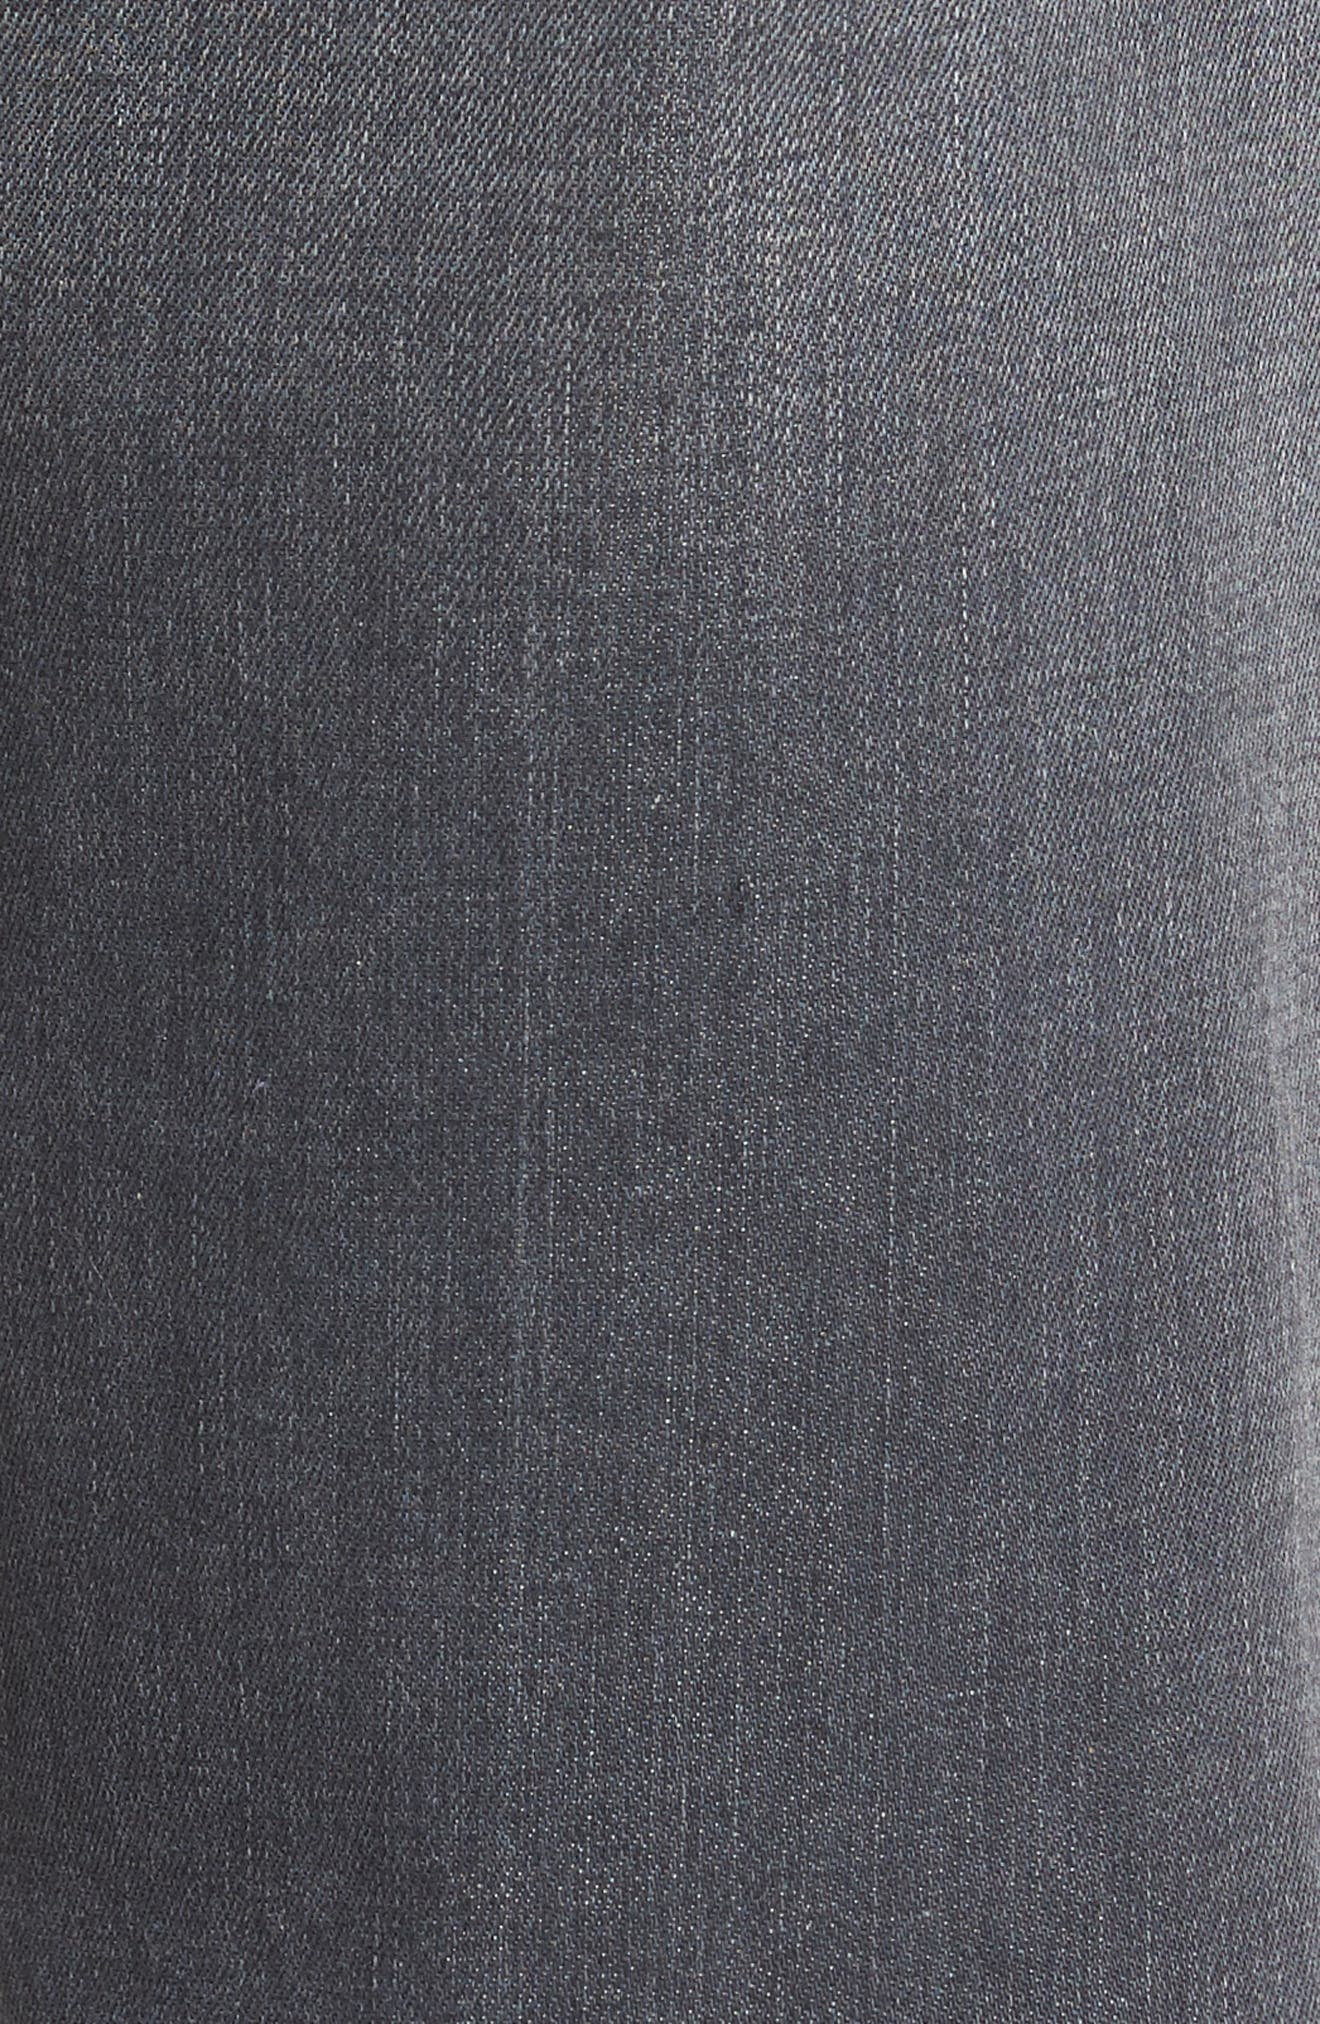 Jimmy Slim Straight Fit Jeans,                             Alternate thumbnail 5, color,                             Steelo Vintage